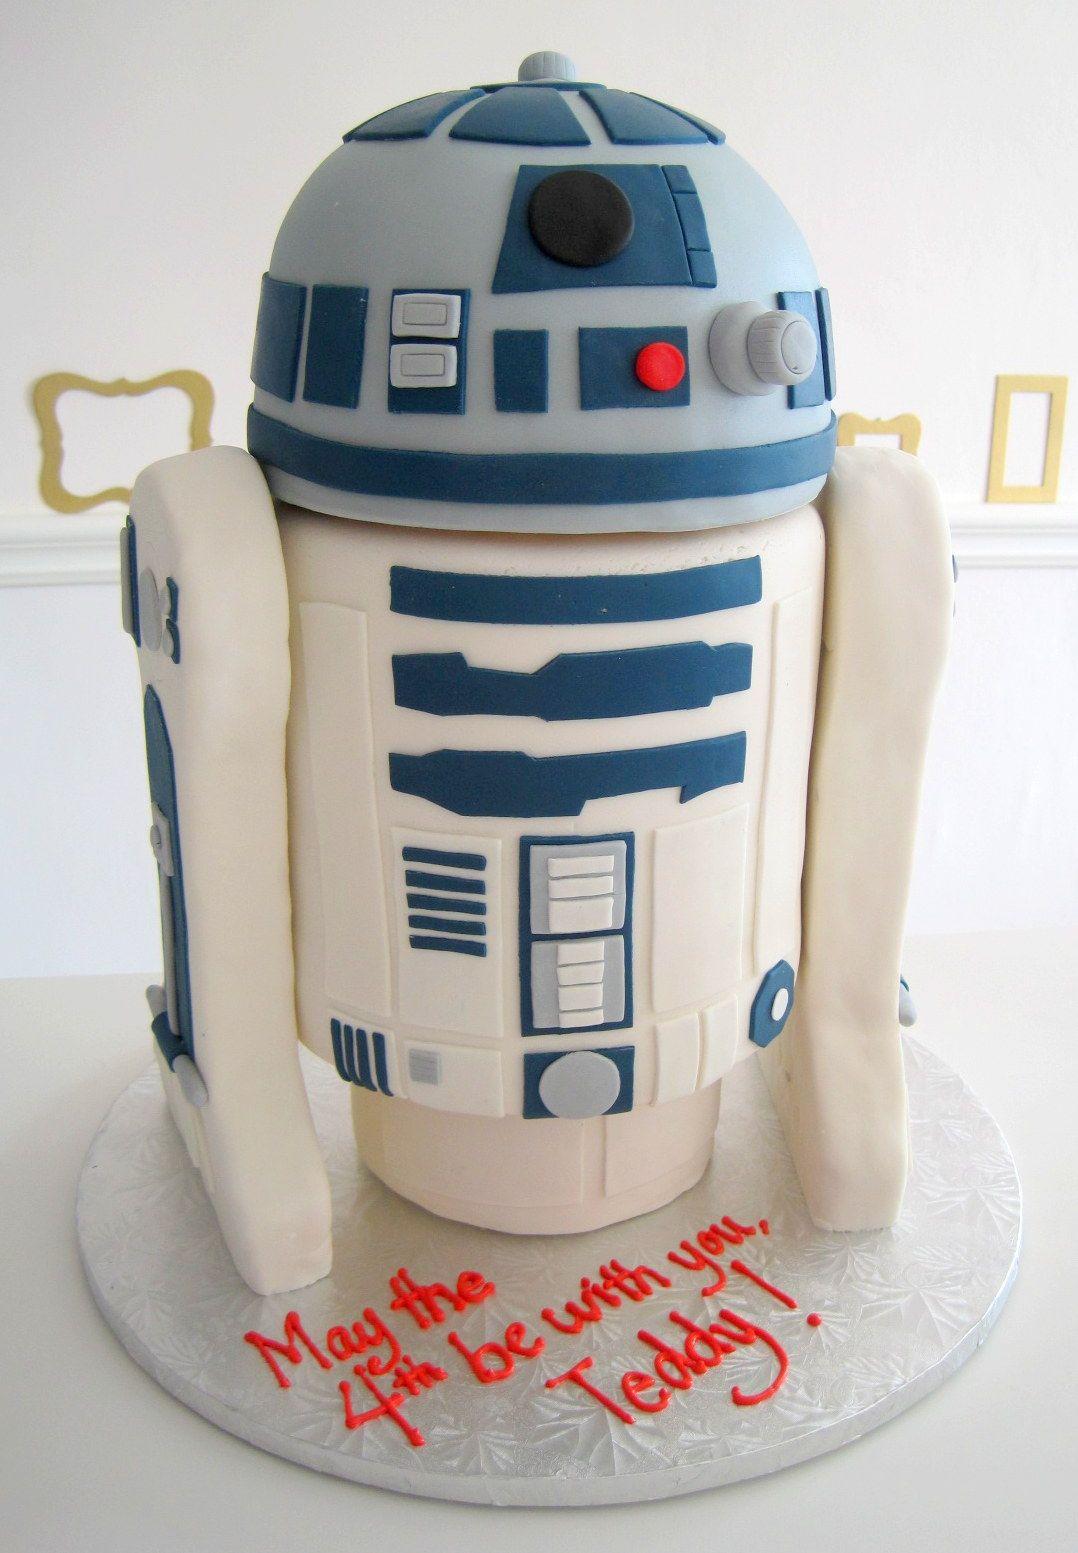 R2D2 Star Wars Cake   Baby Bea's Bakeshop